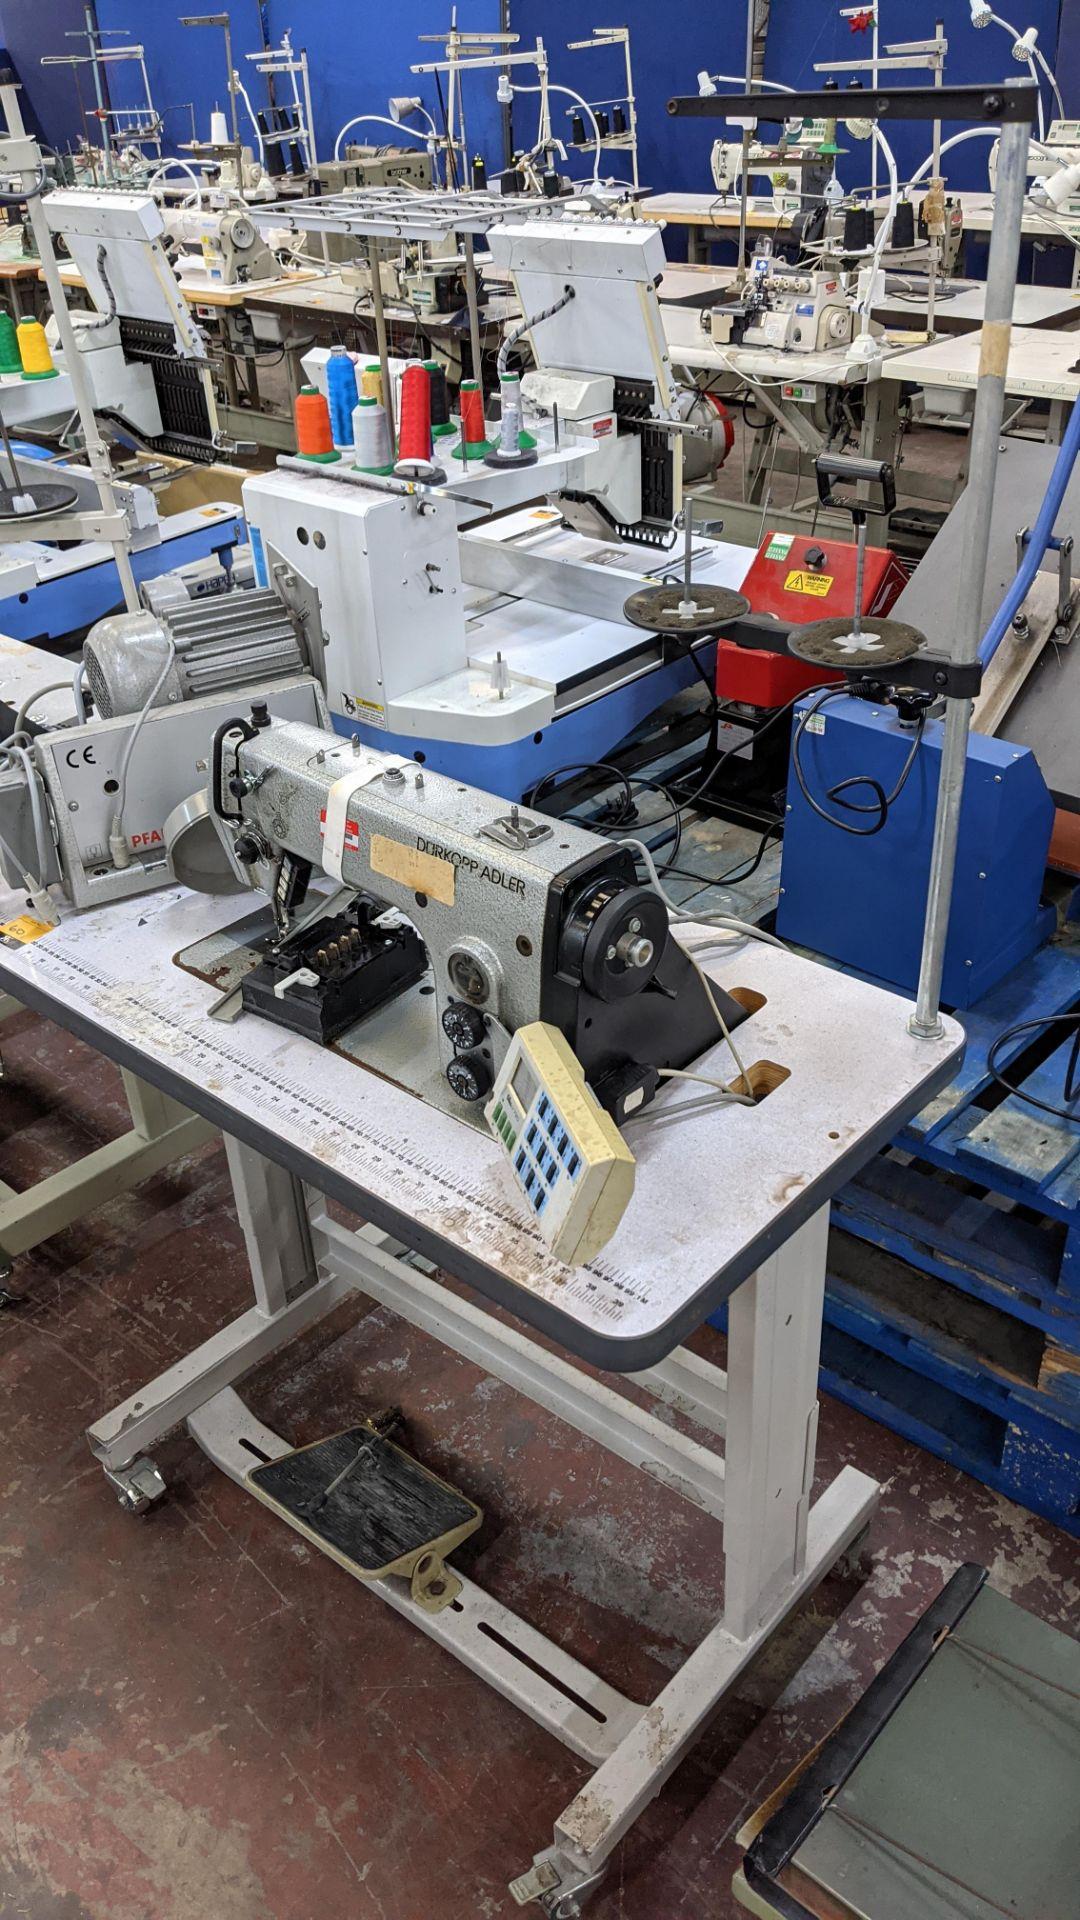 Durkopp Adler type 0271-L40042 sewing machine - Image 4 of 19